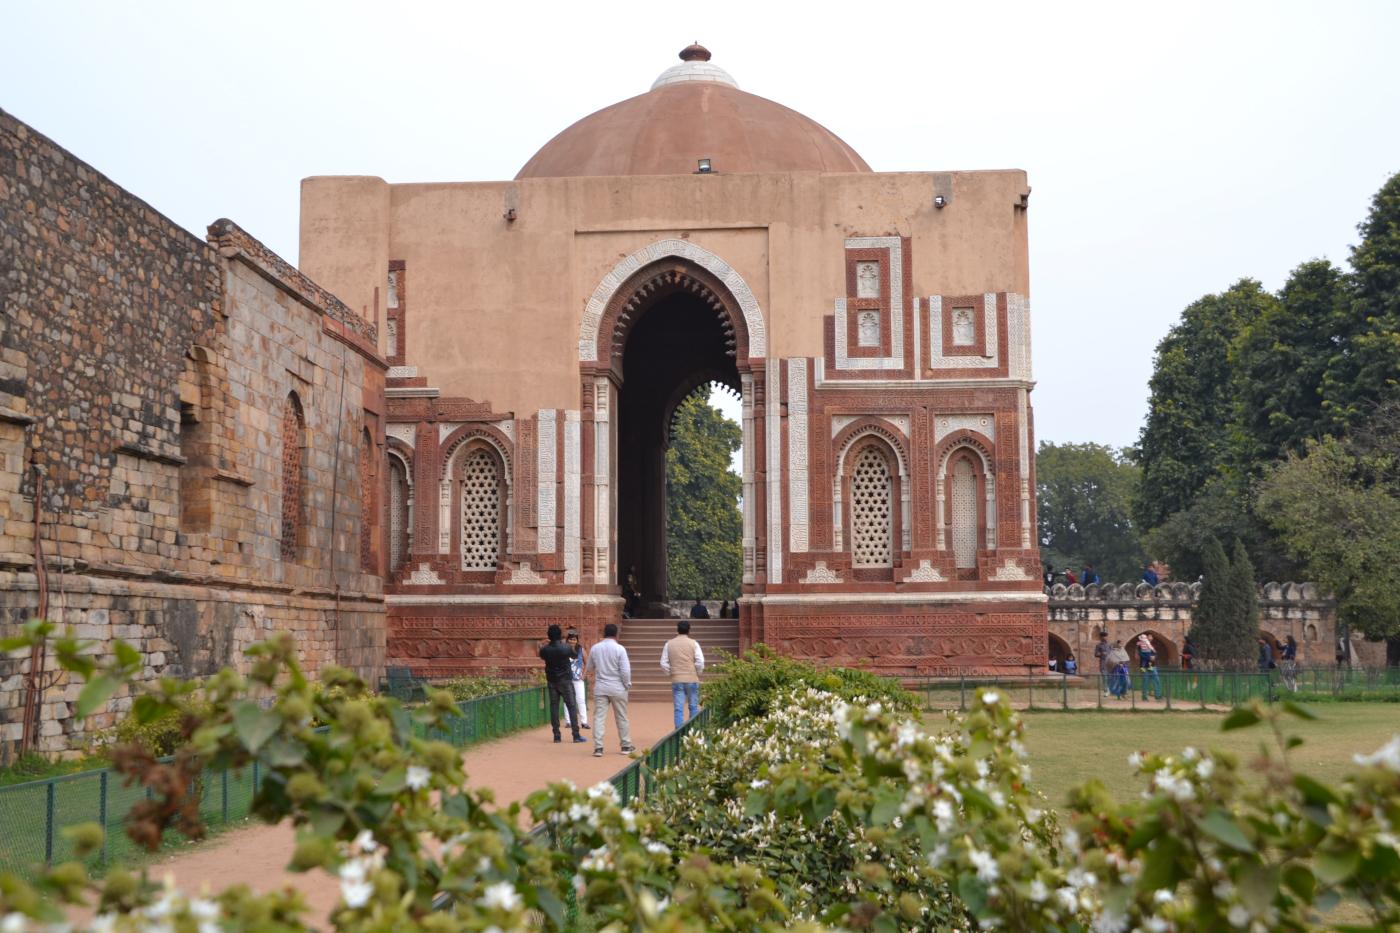 Фото 8. Мавзолей Алауддина Хильджи на территории комплекса Кутб-Минар в Дели. 1/250, 8, 100, 55.